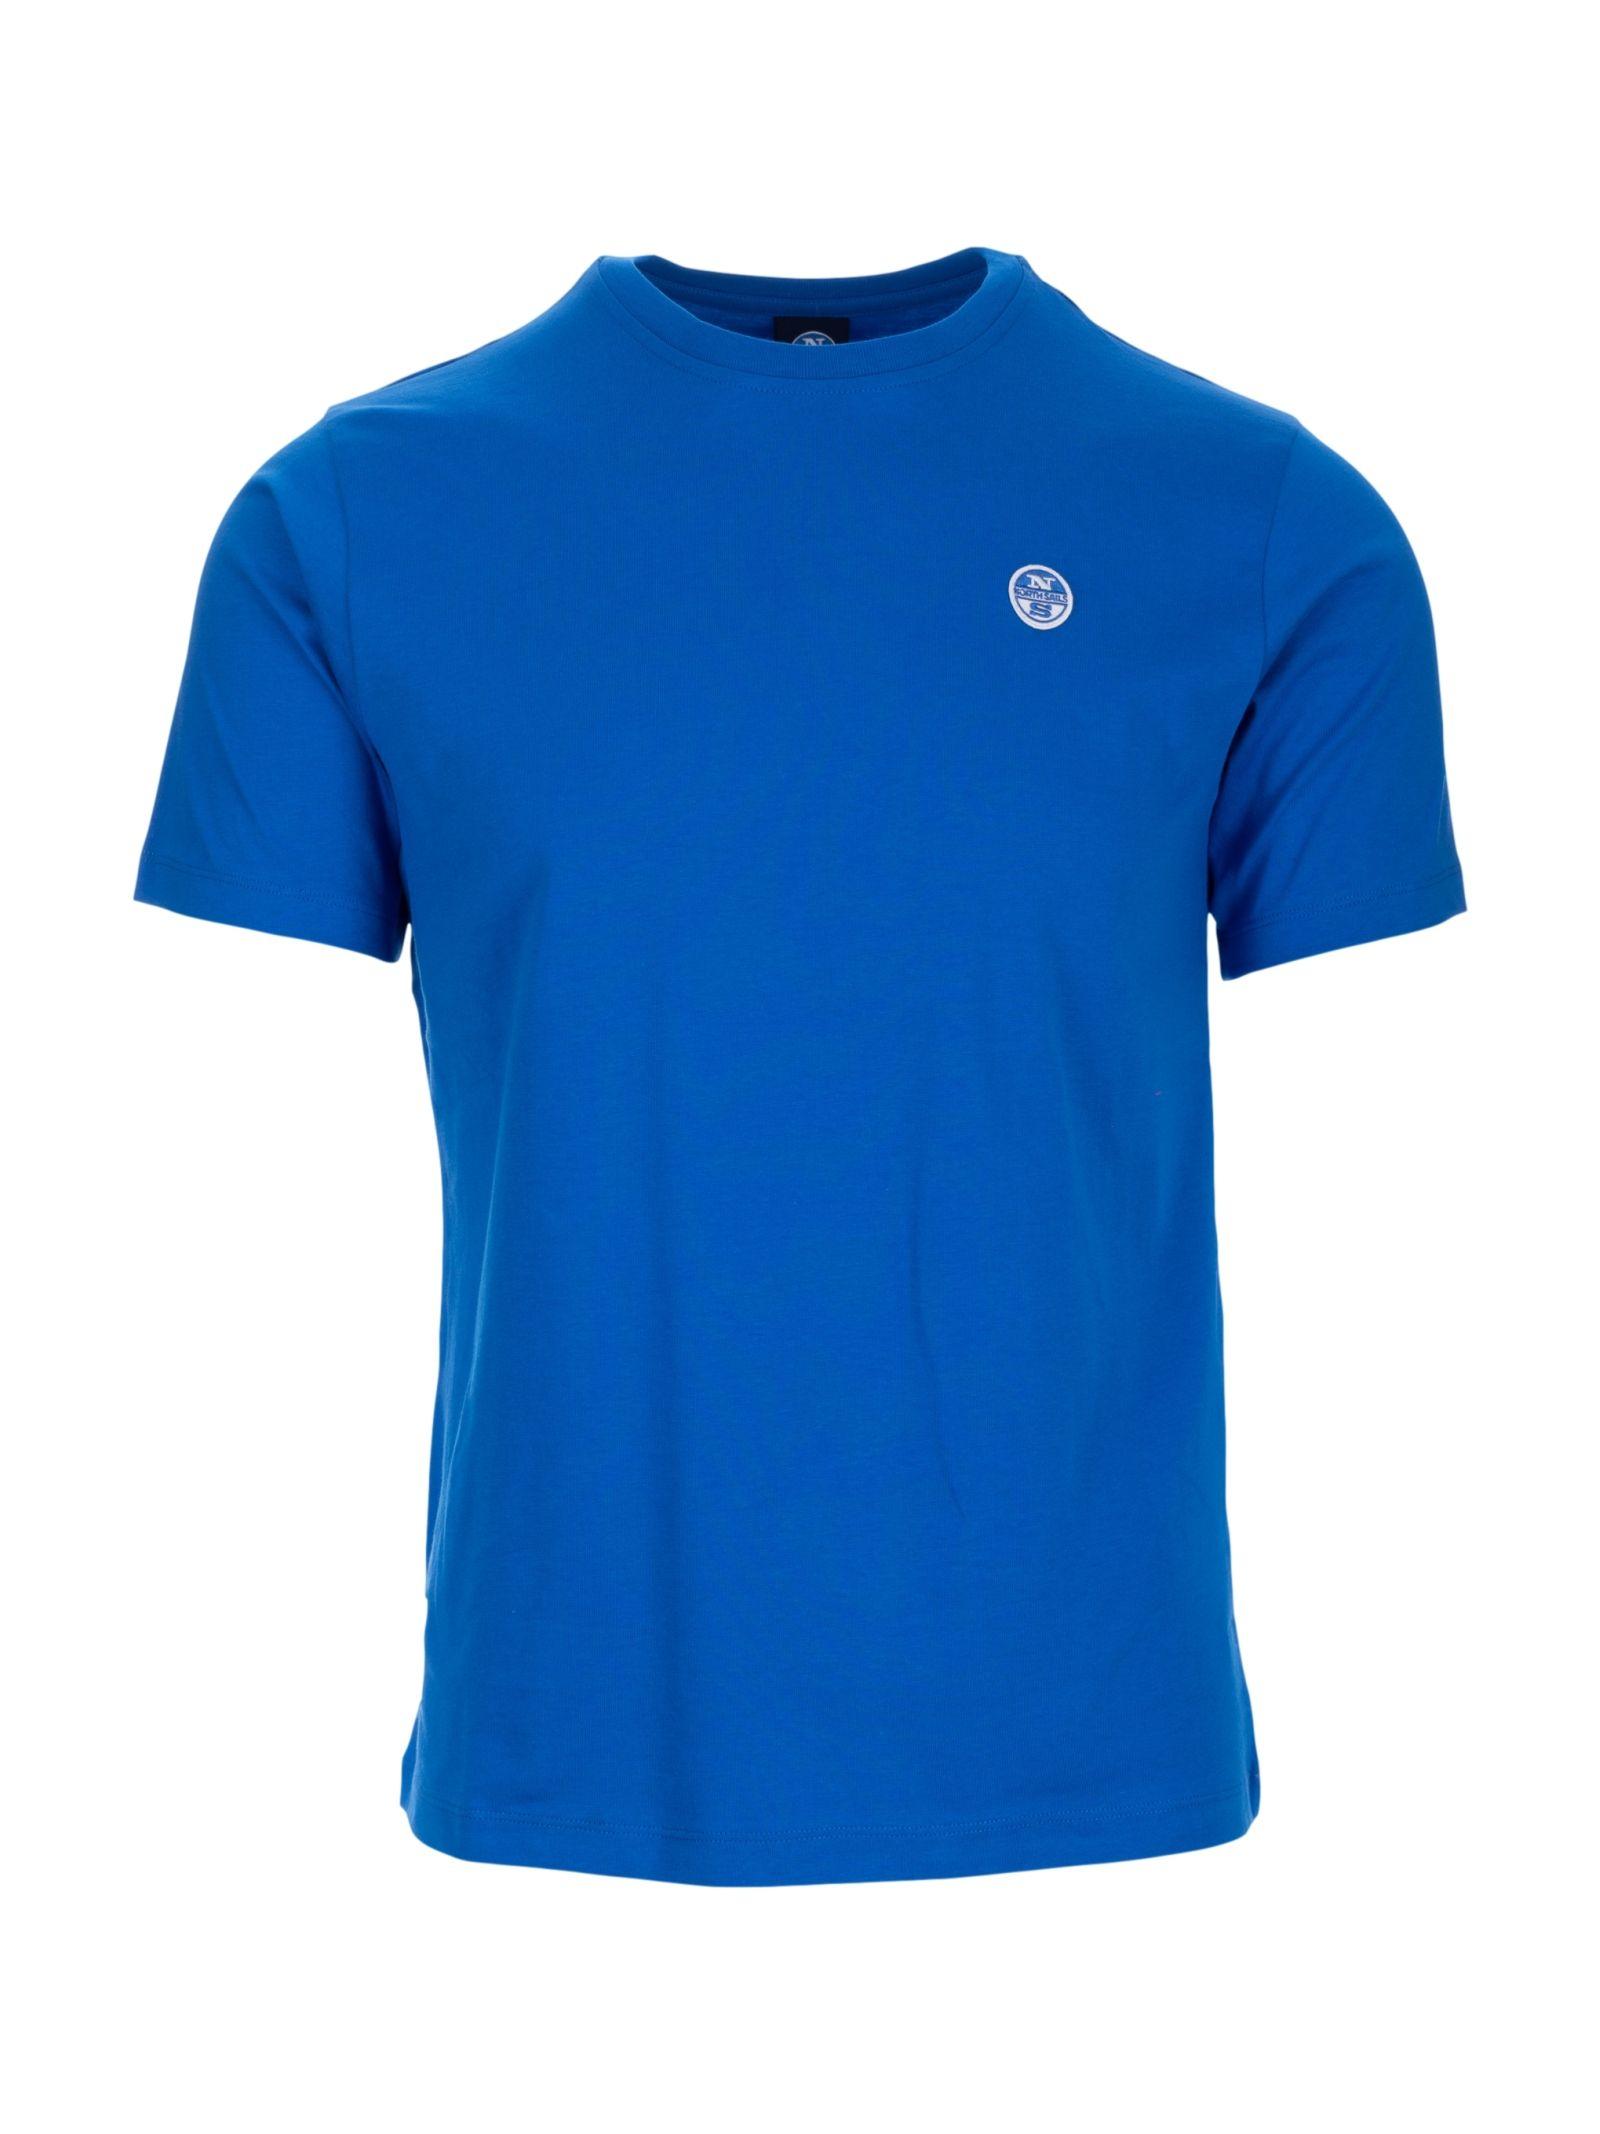 North Sails T-Shirt 692530 000